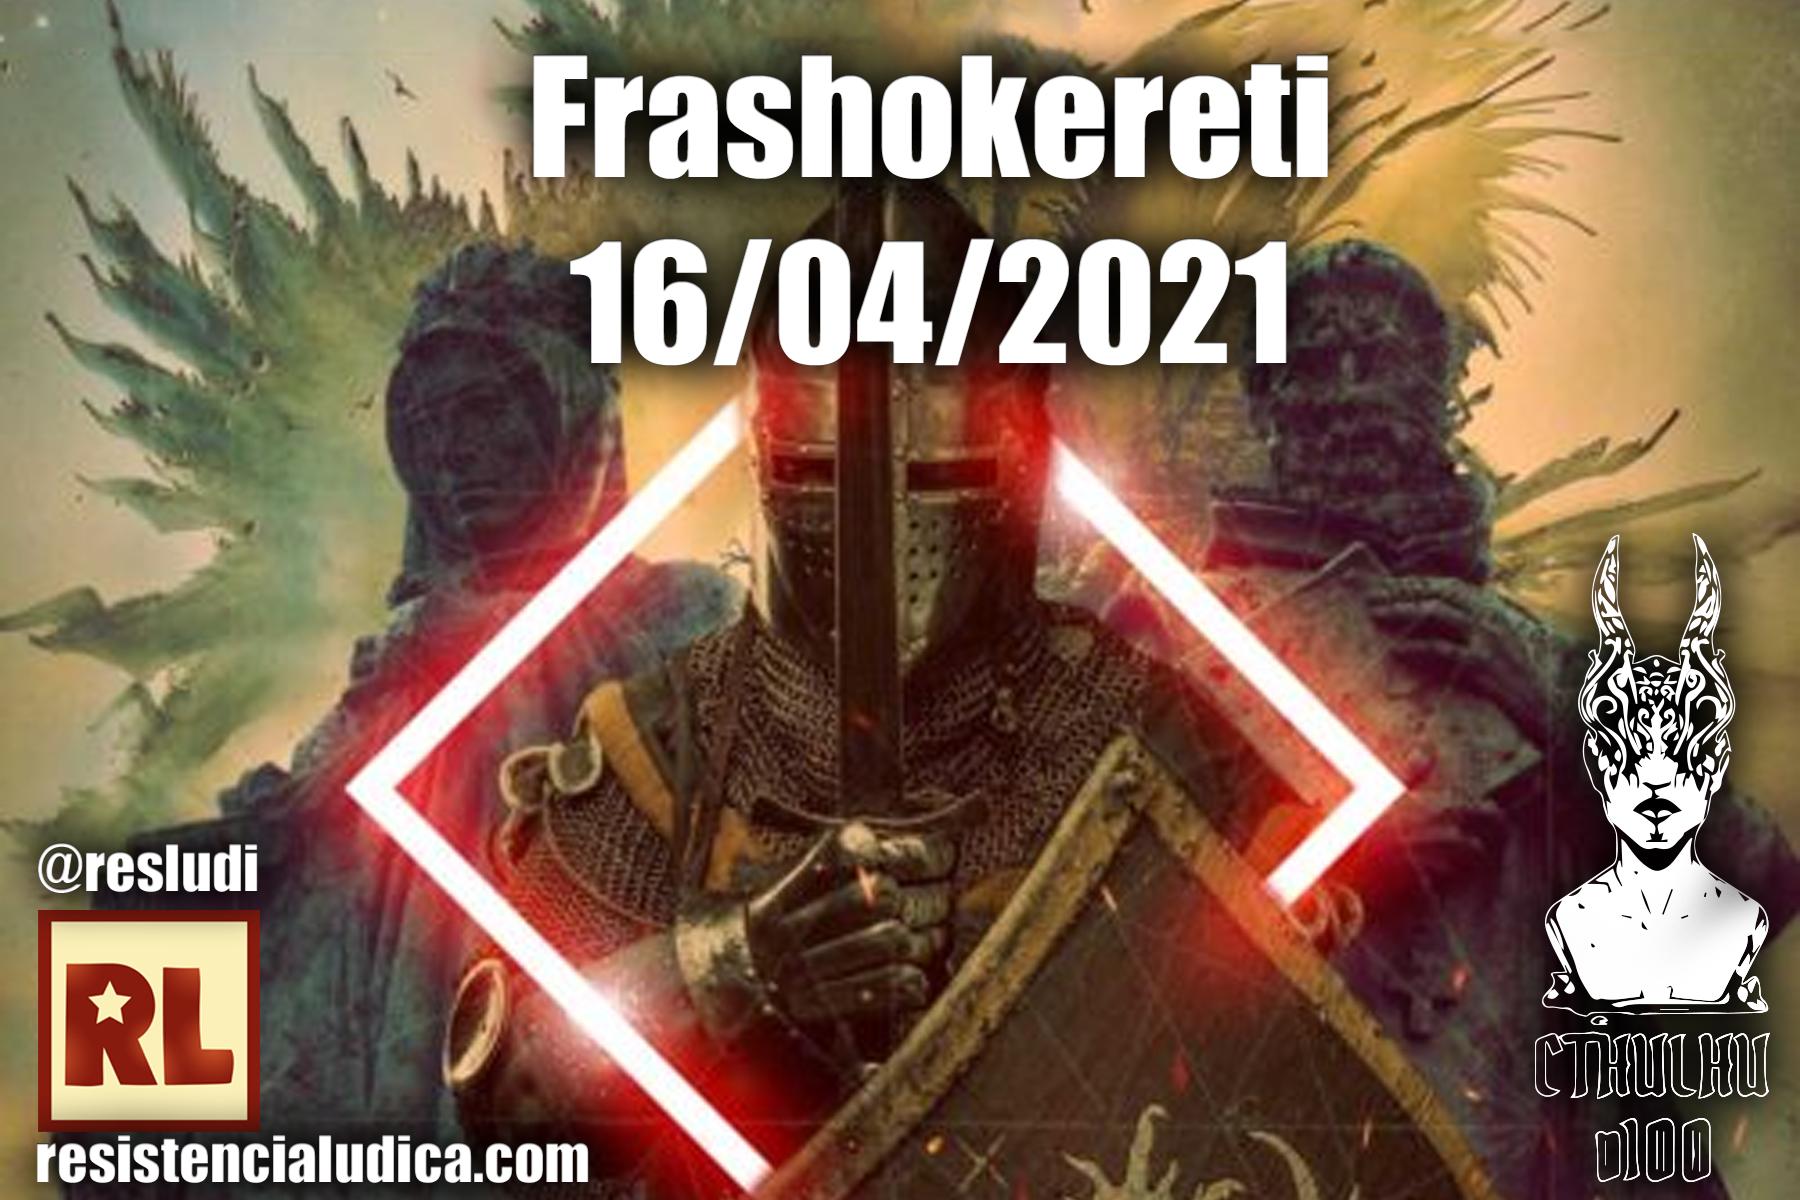 Resistencia Lúdica - Frashokereti (Cthulhu D100)